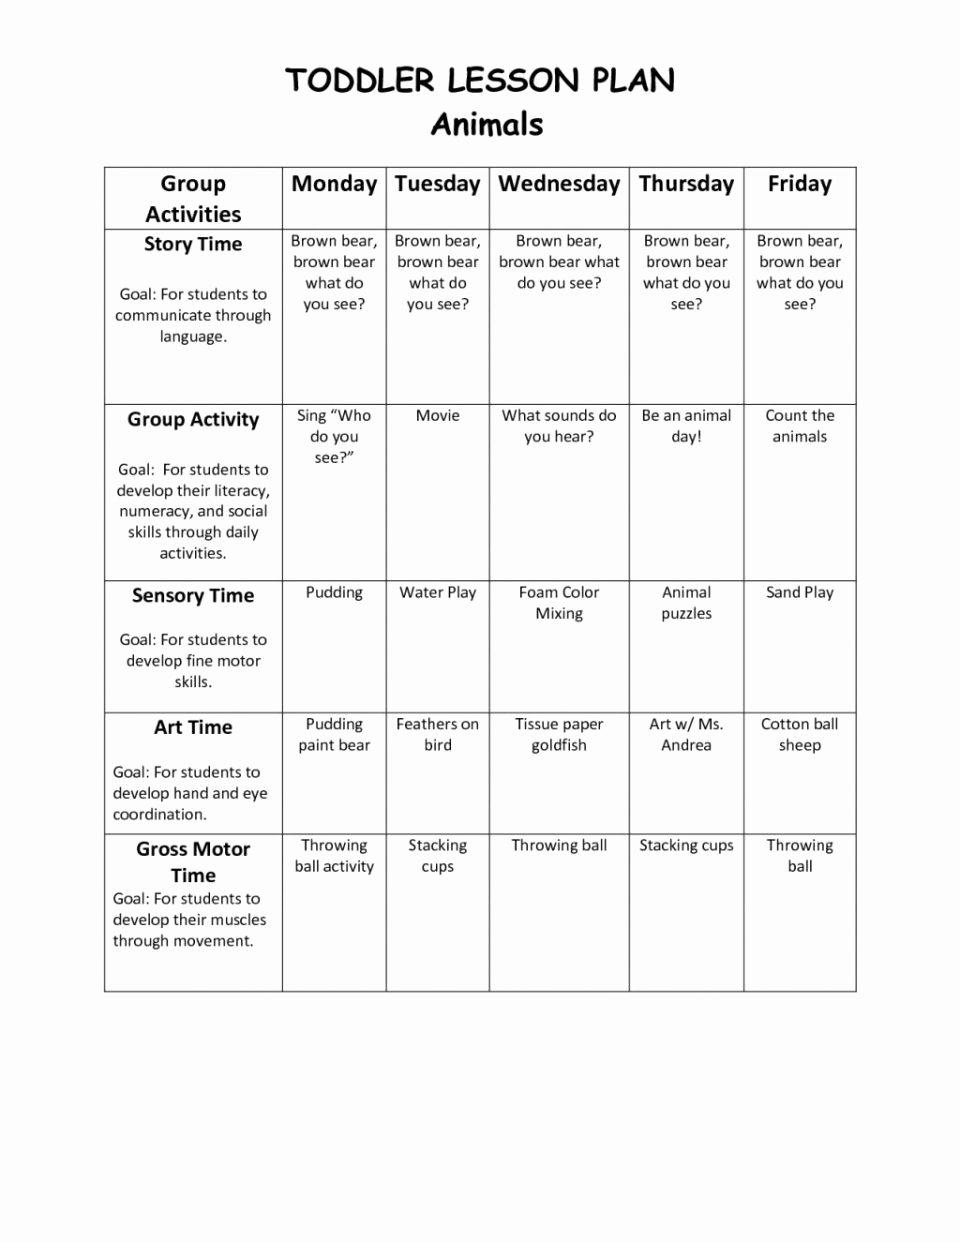 Math Lesson Plan Template New Edtpa Math Lesson Plan Template – Best Lesson Plan